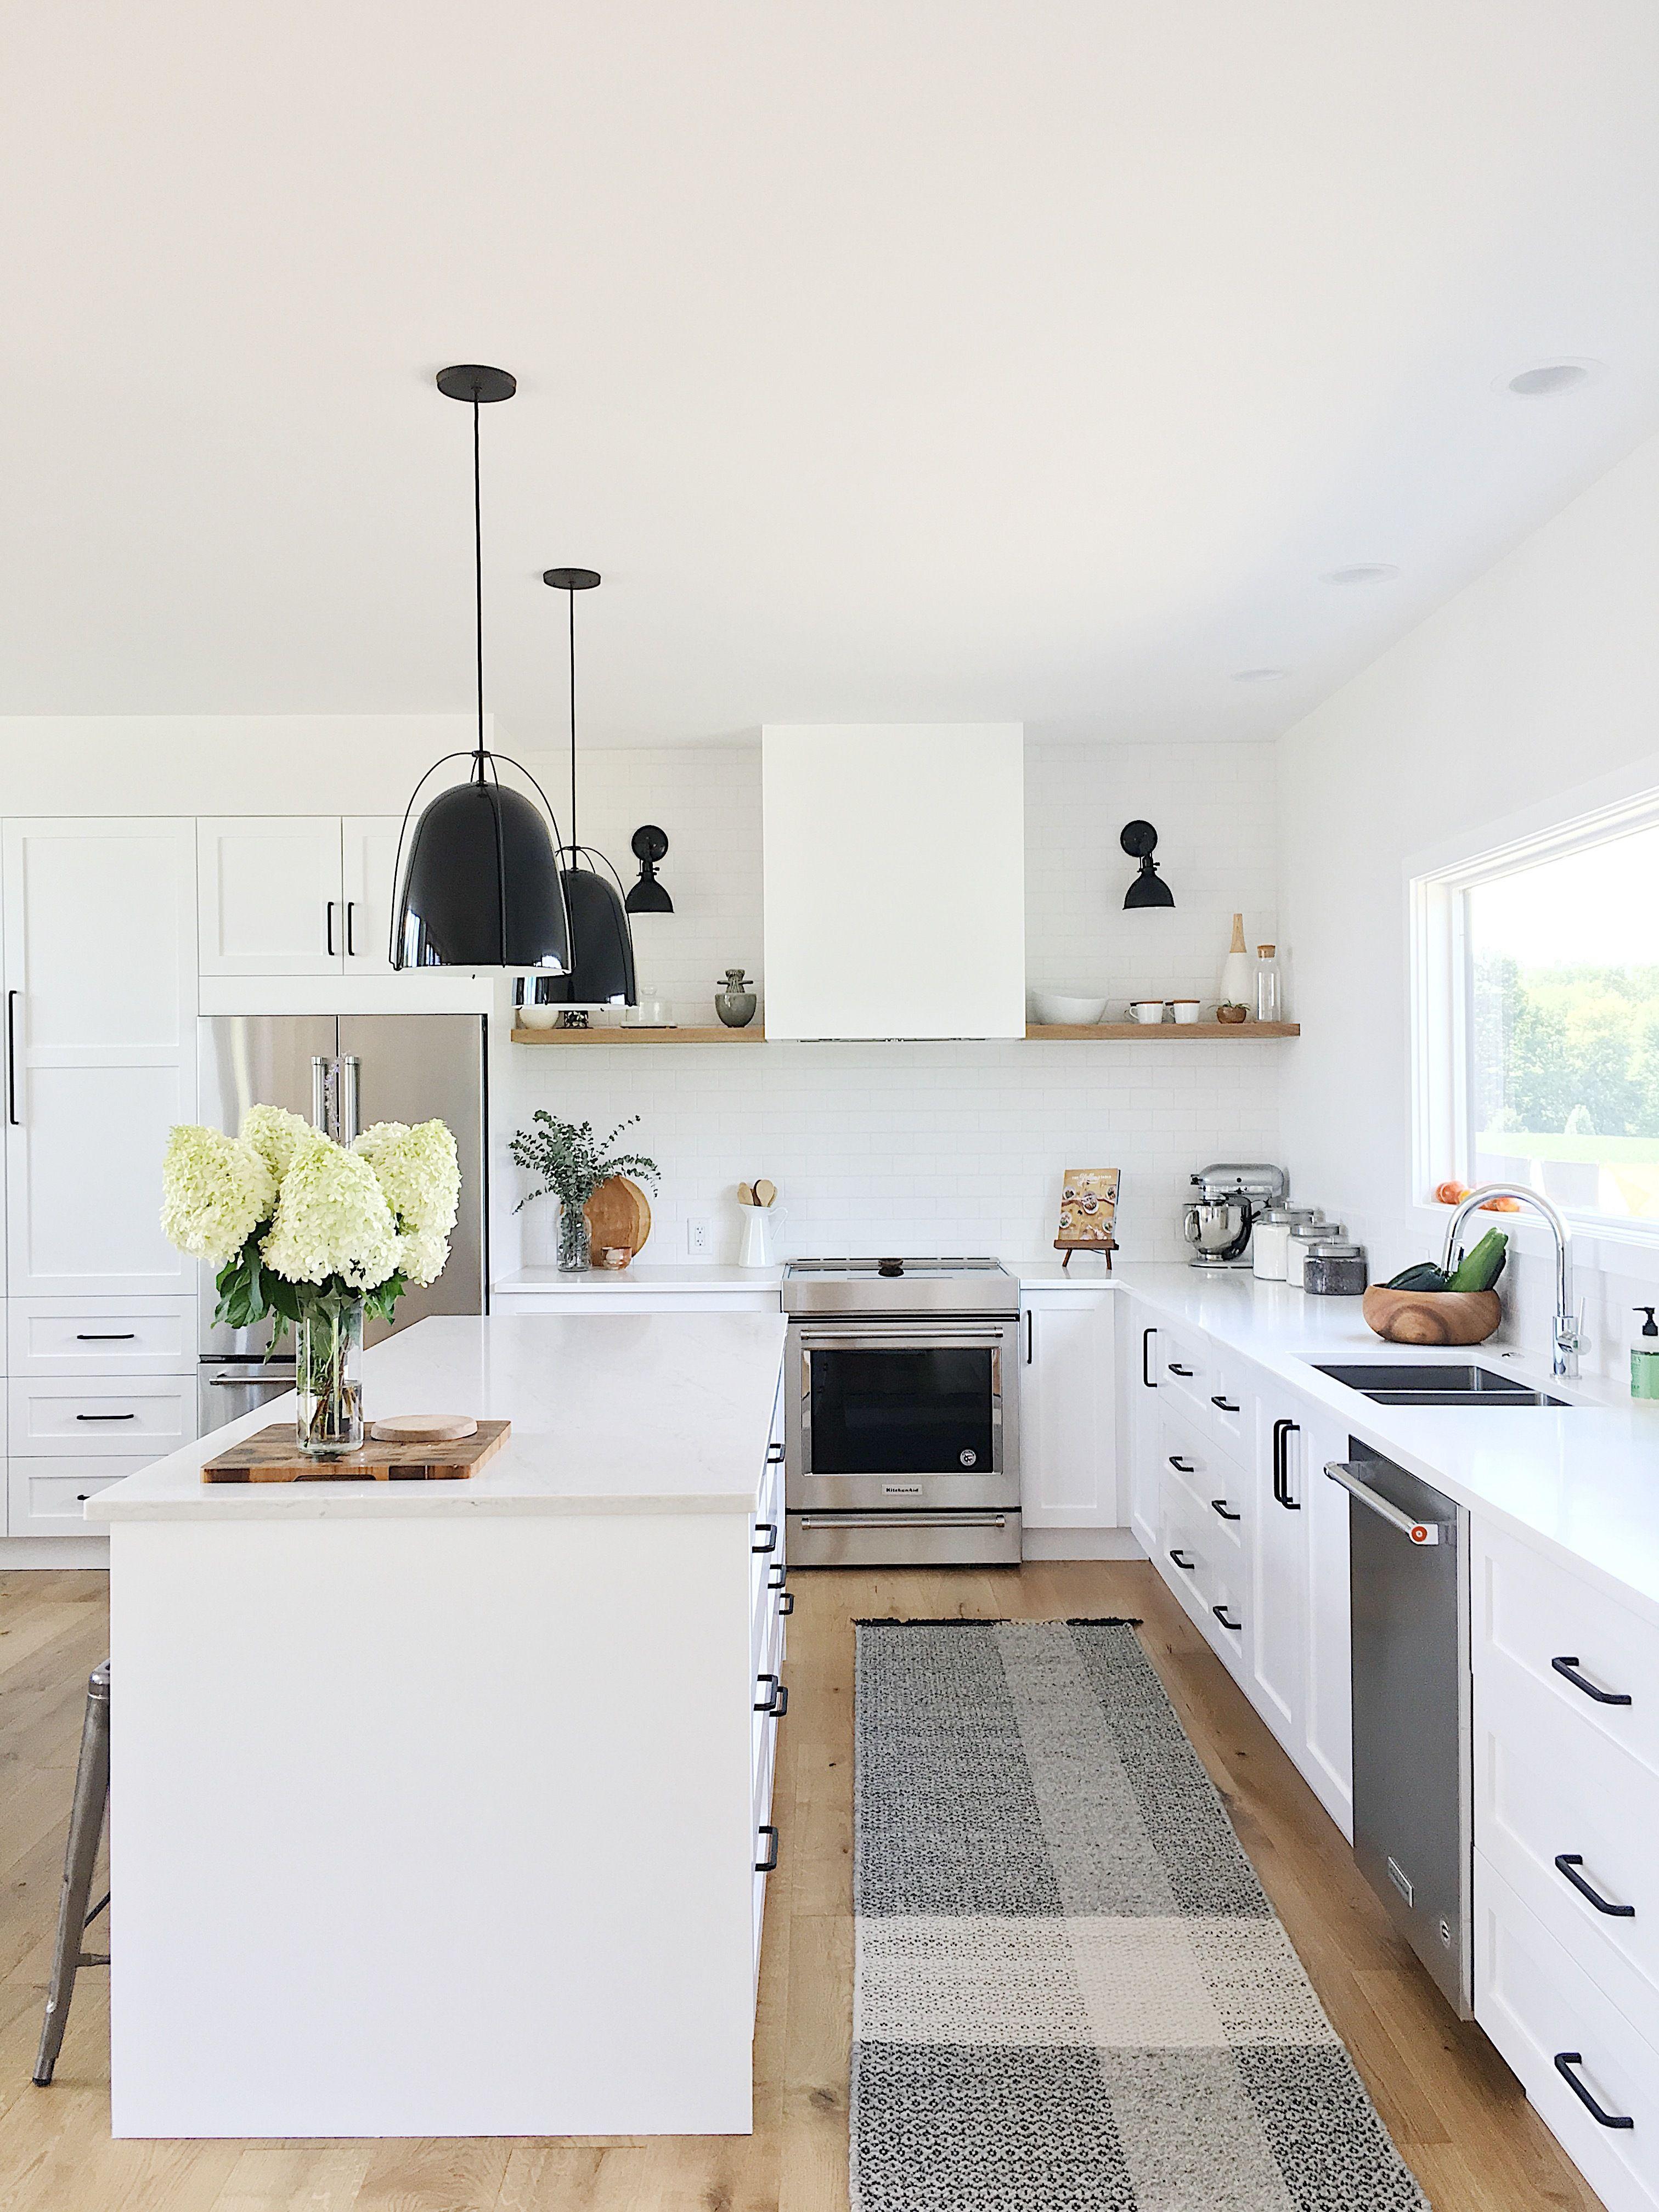 Wonderful Custom Design Ideas For Your Kitchen Cabinets & Island ...